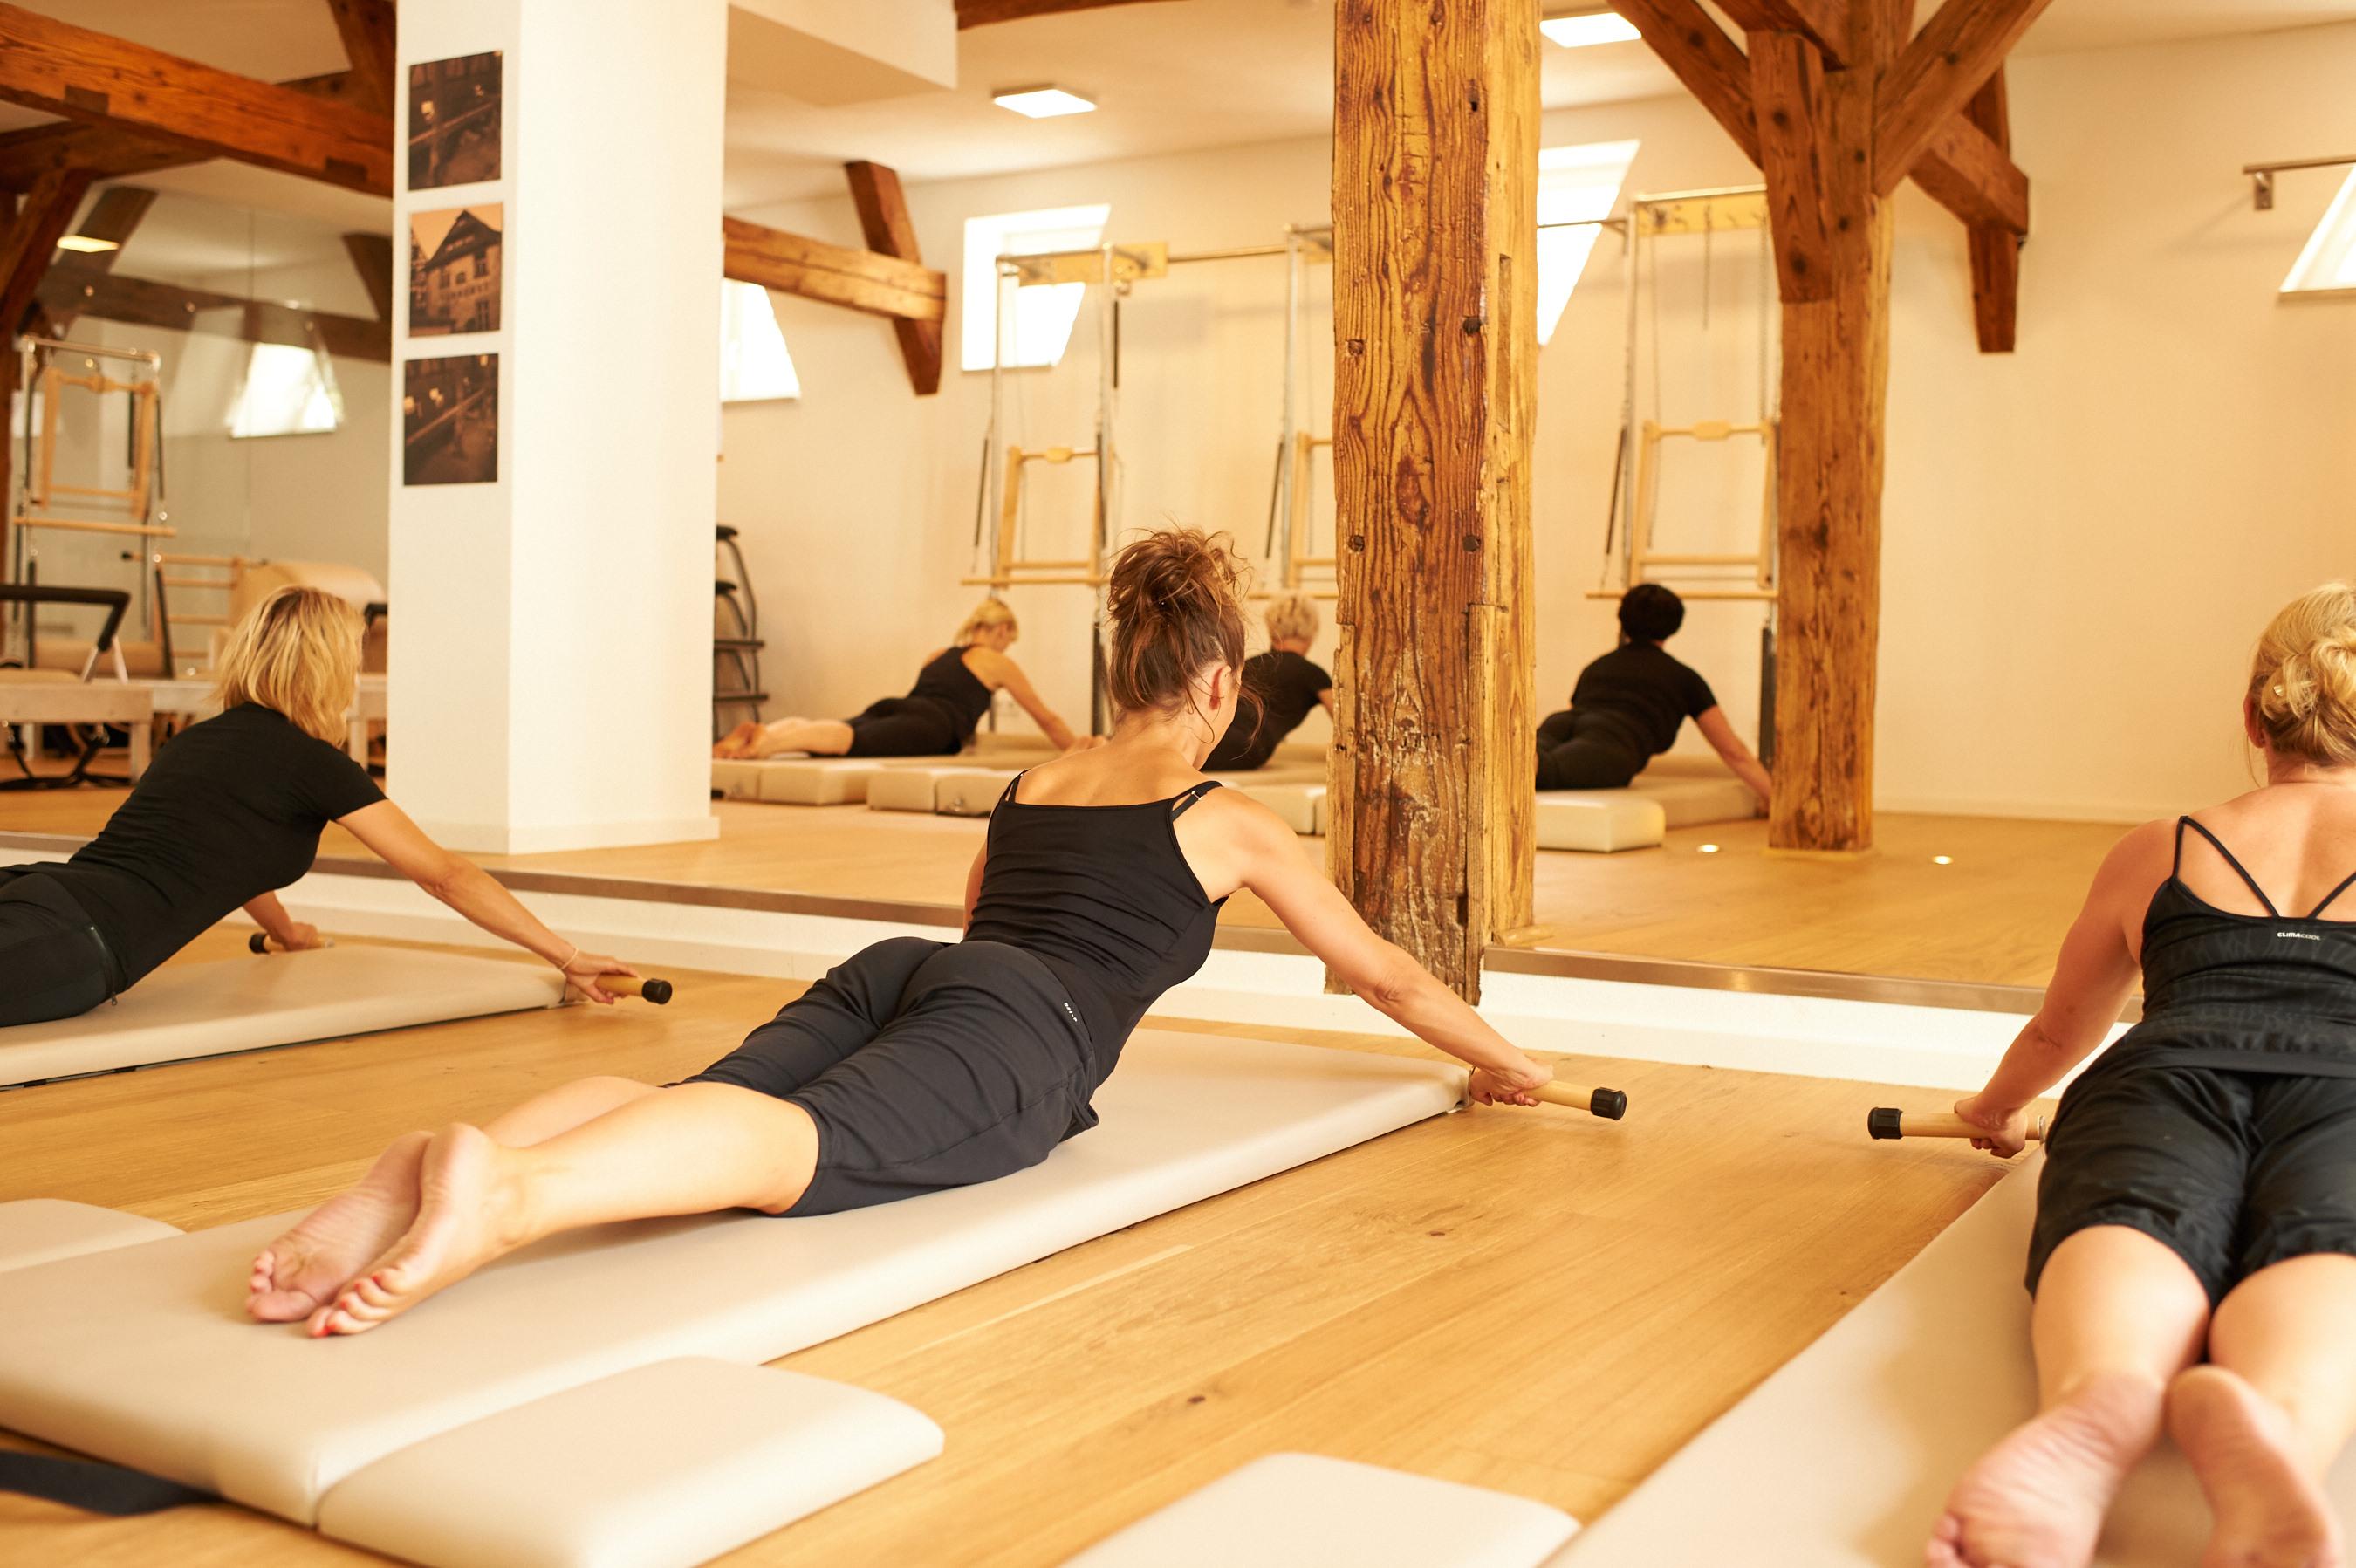 pilates yoga wohlf hlen physiotherapie pilates yoga pr vention und wellness. Black Bedroom Furniture Sets. Home Design Ideas